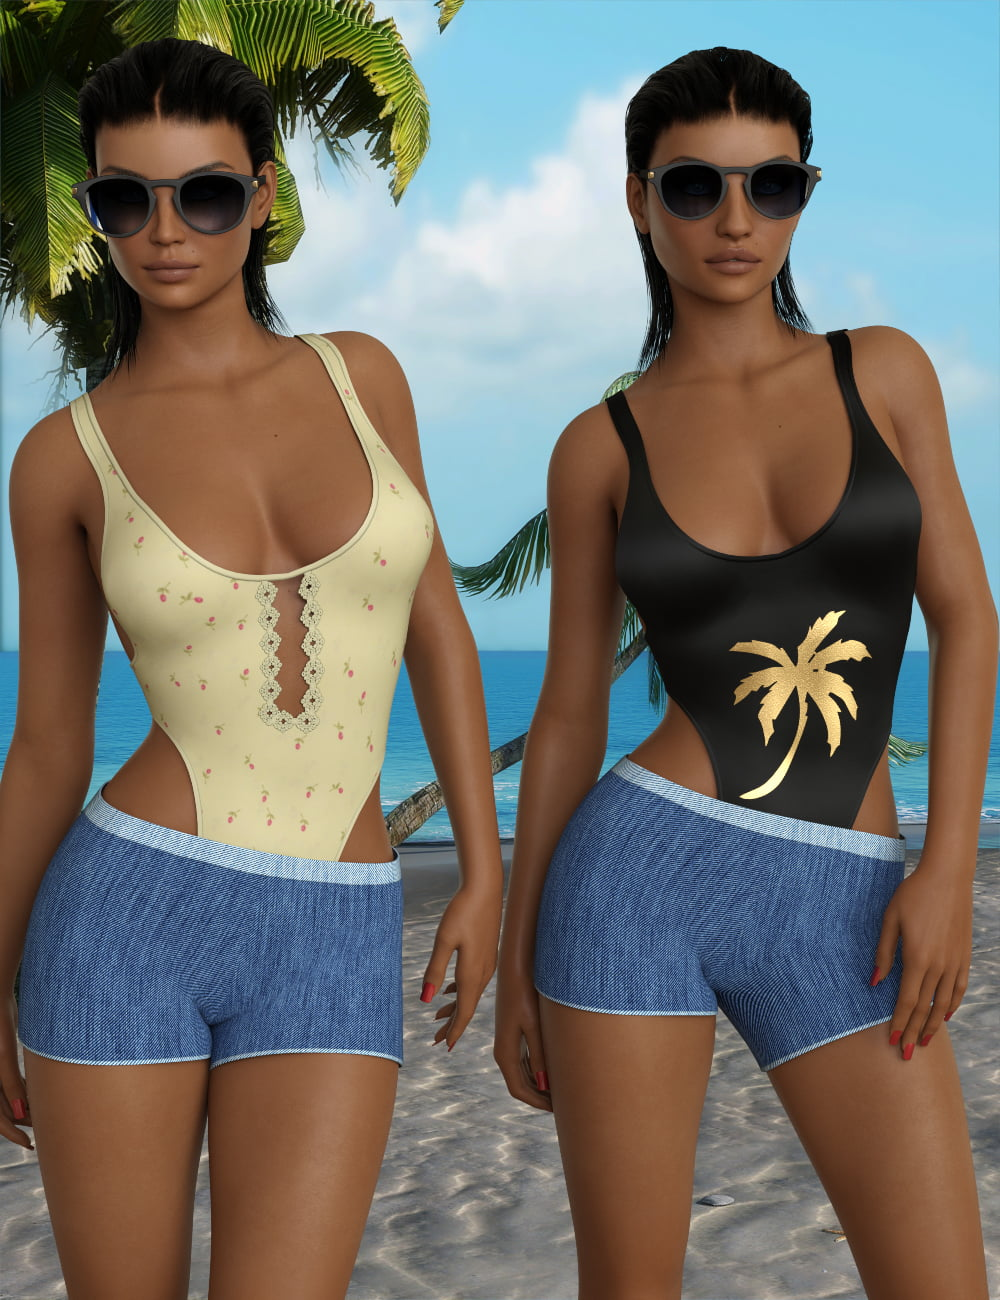 InStyle - dForce UltraFine Swimsuit for Genesis 8 Females